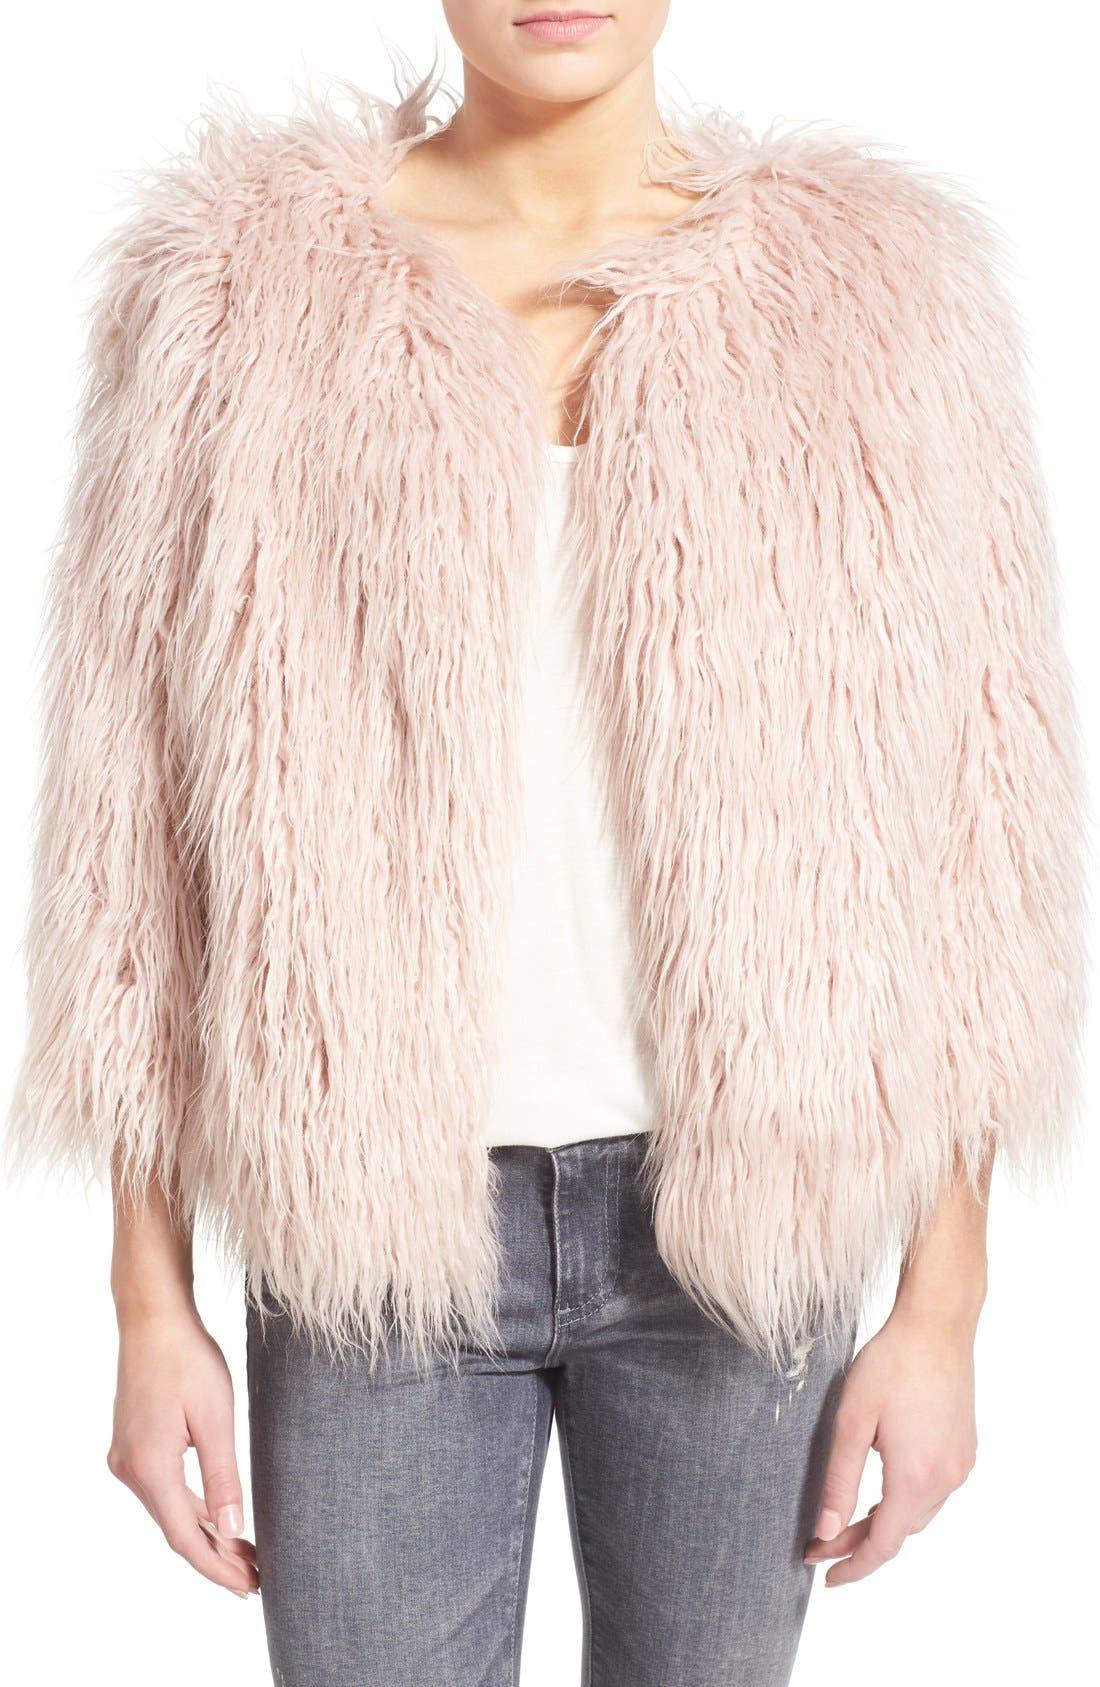 PAM & GELA 'Mongolian' Faux Fur Coat, Main, color, 650